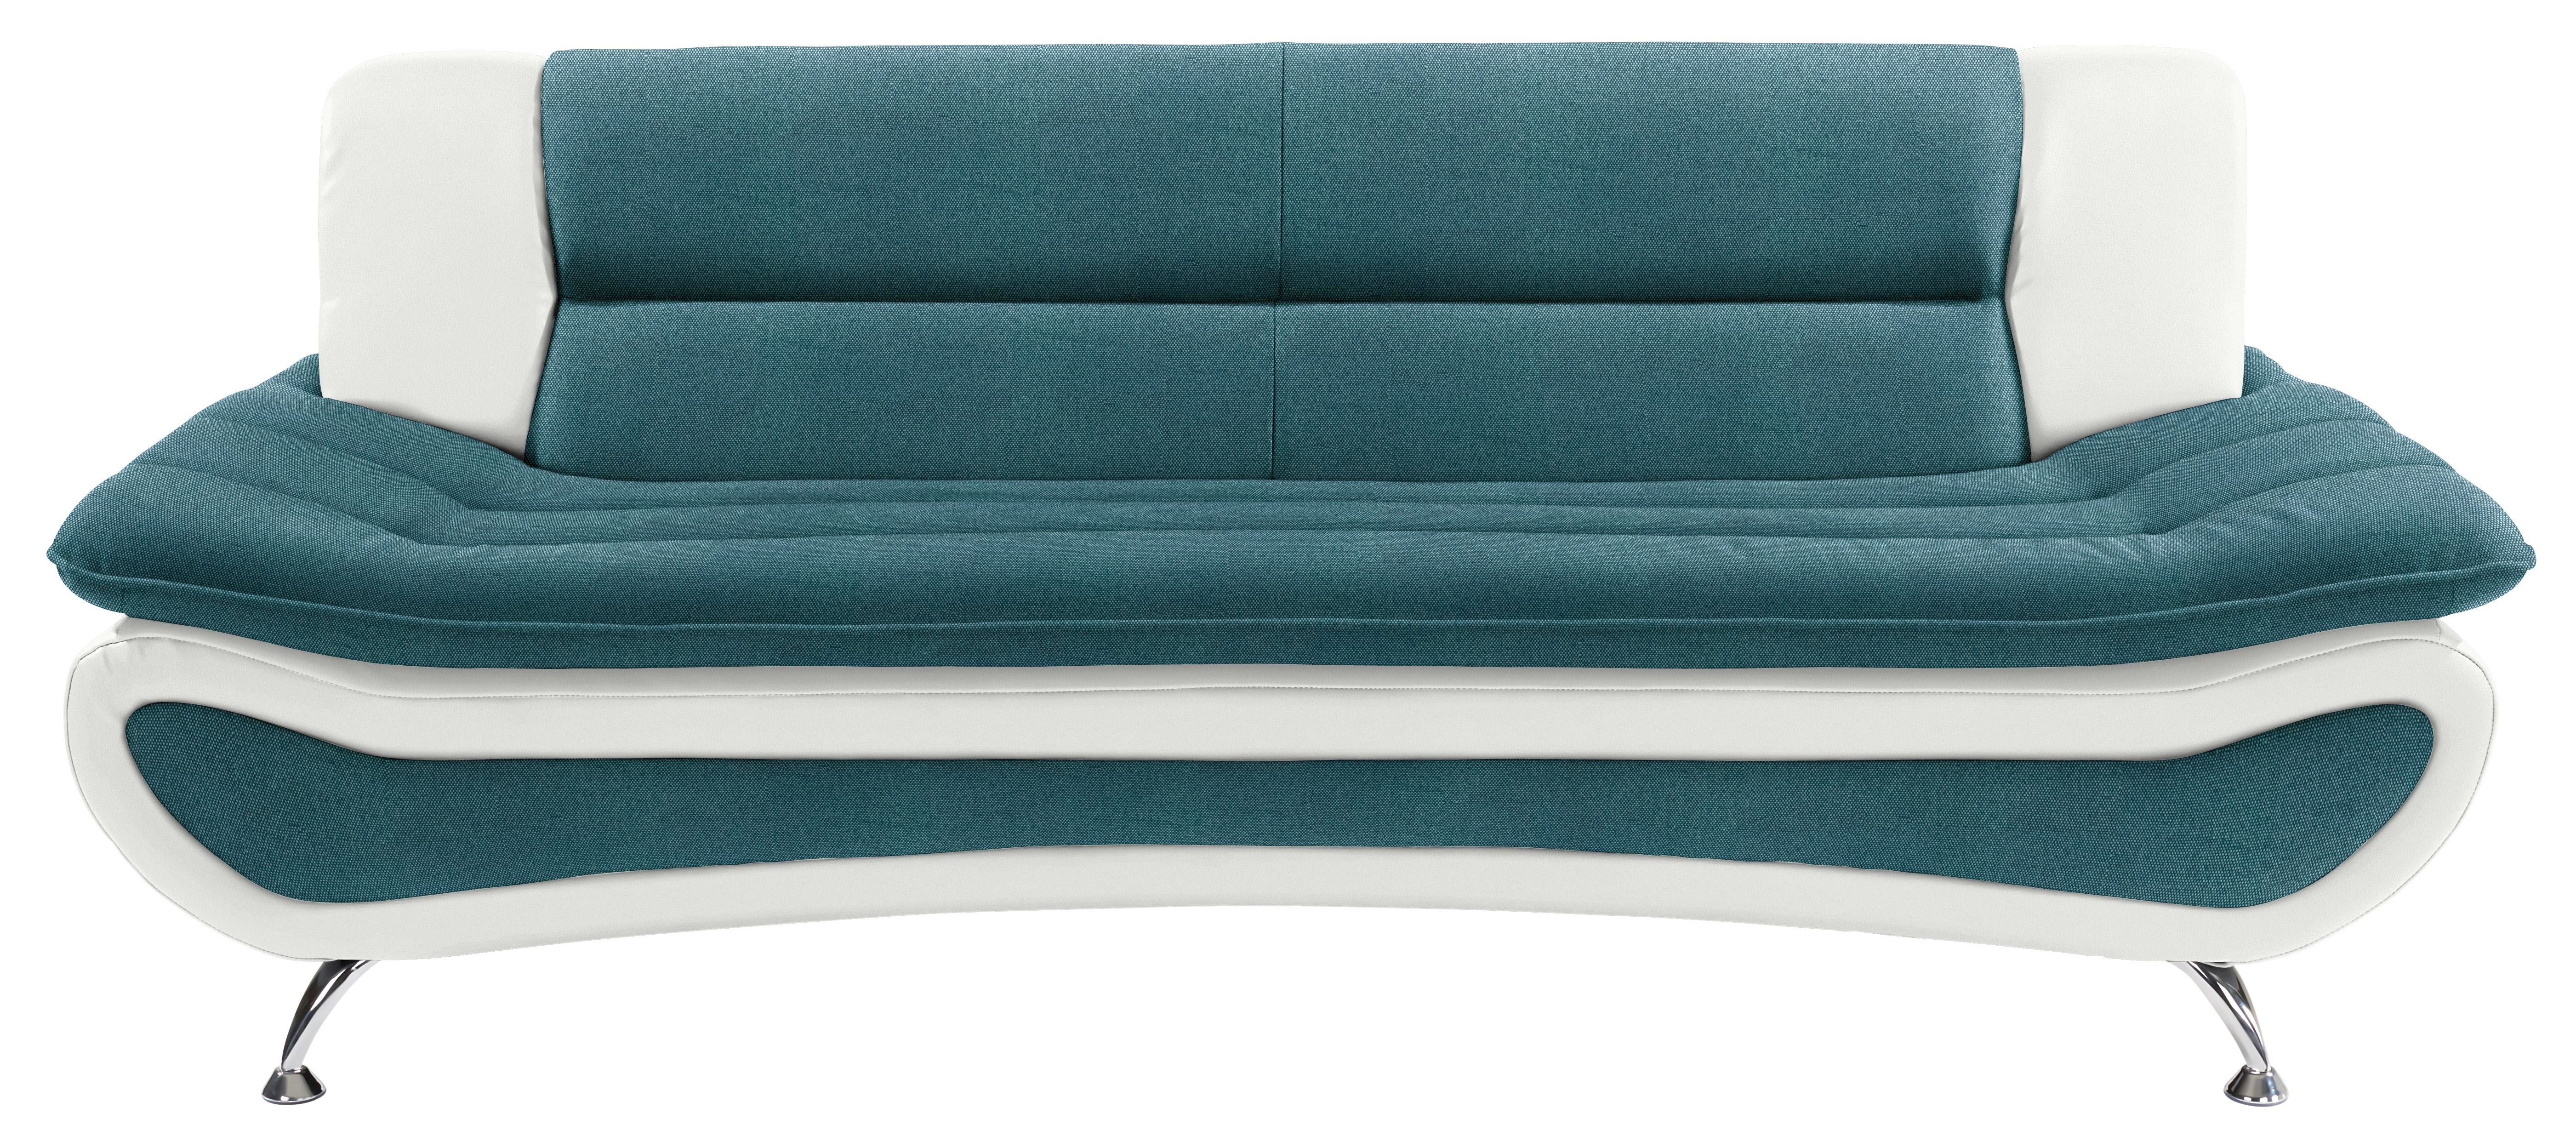 Dreisitzer-sofa Atlantis B: 198cm - Türkis/Chromfarben, MODERN, Textil (198/81/89cm)